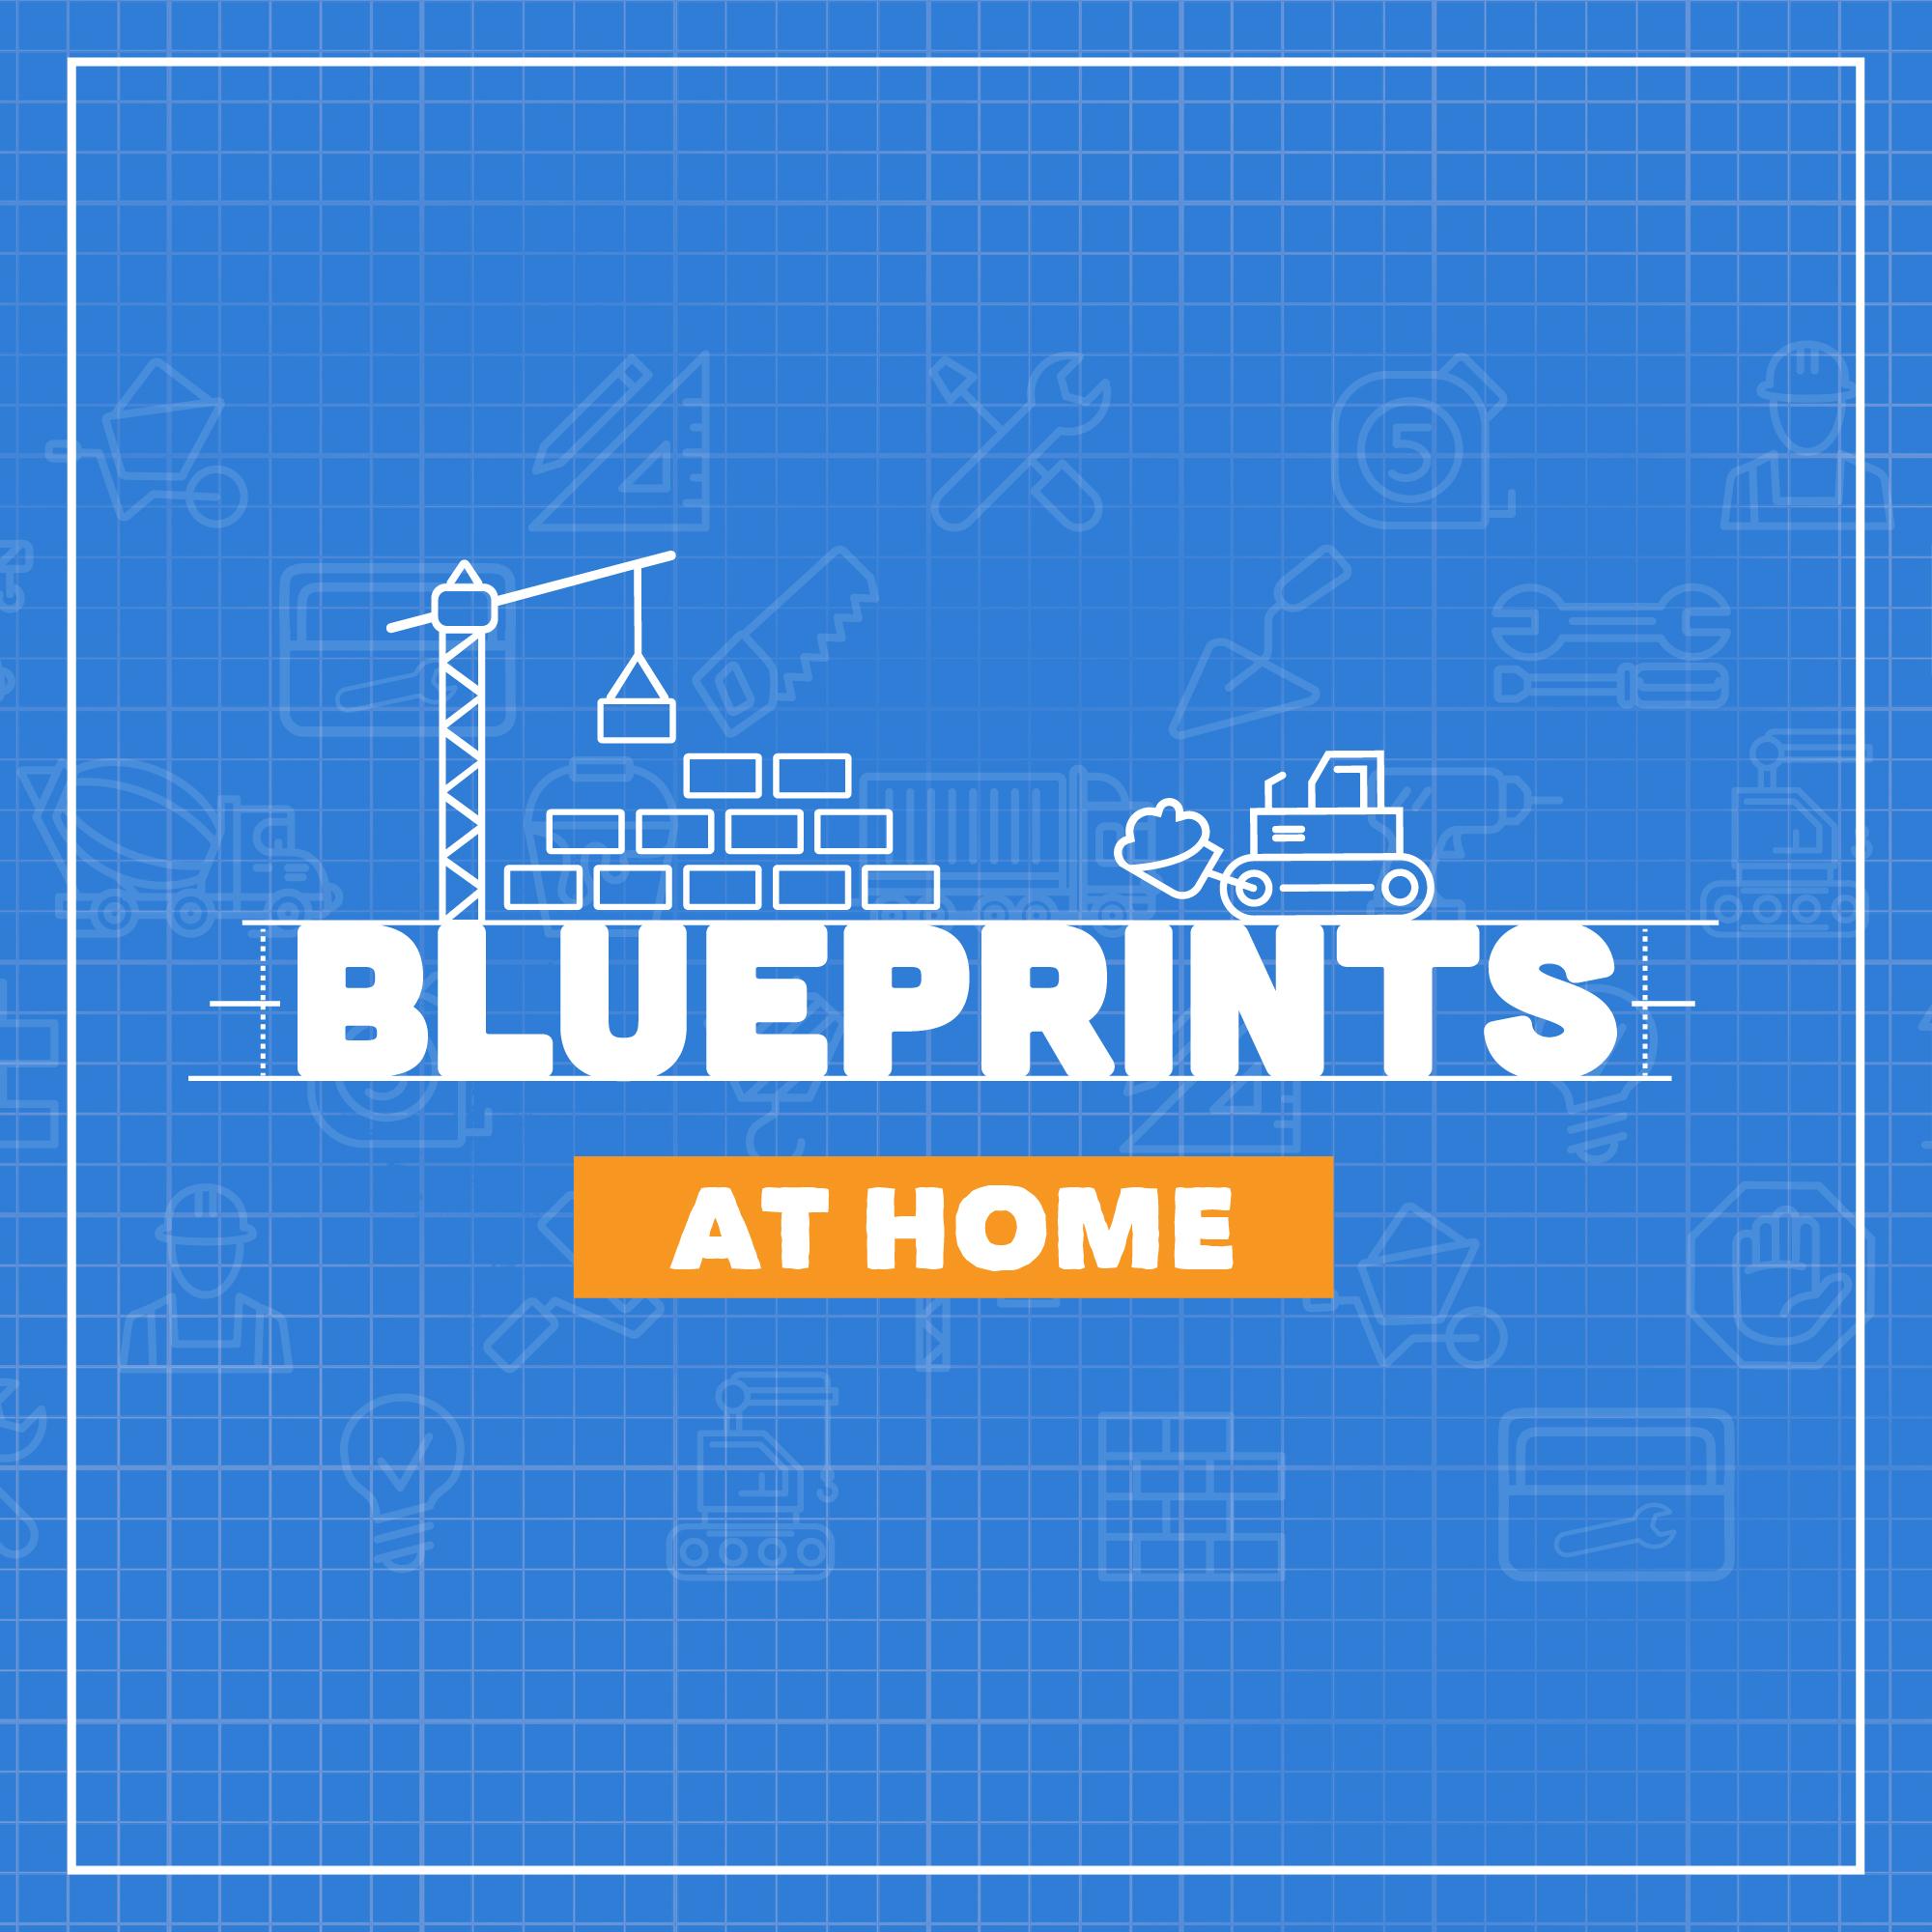 Blueprints Hero Image (JPG)